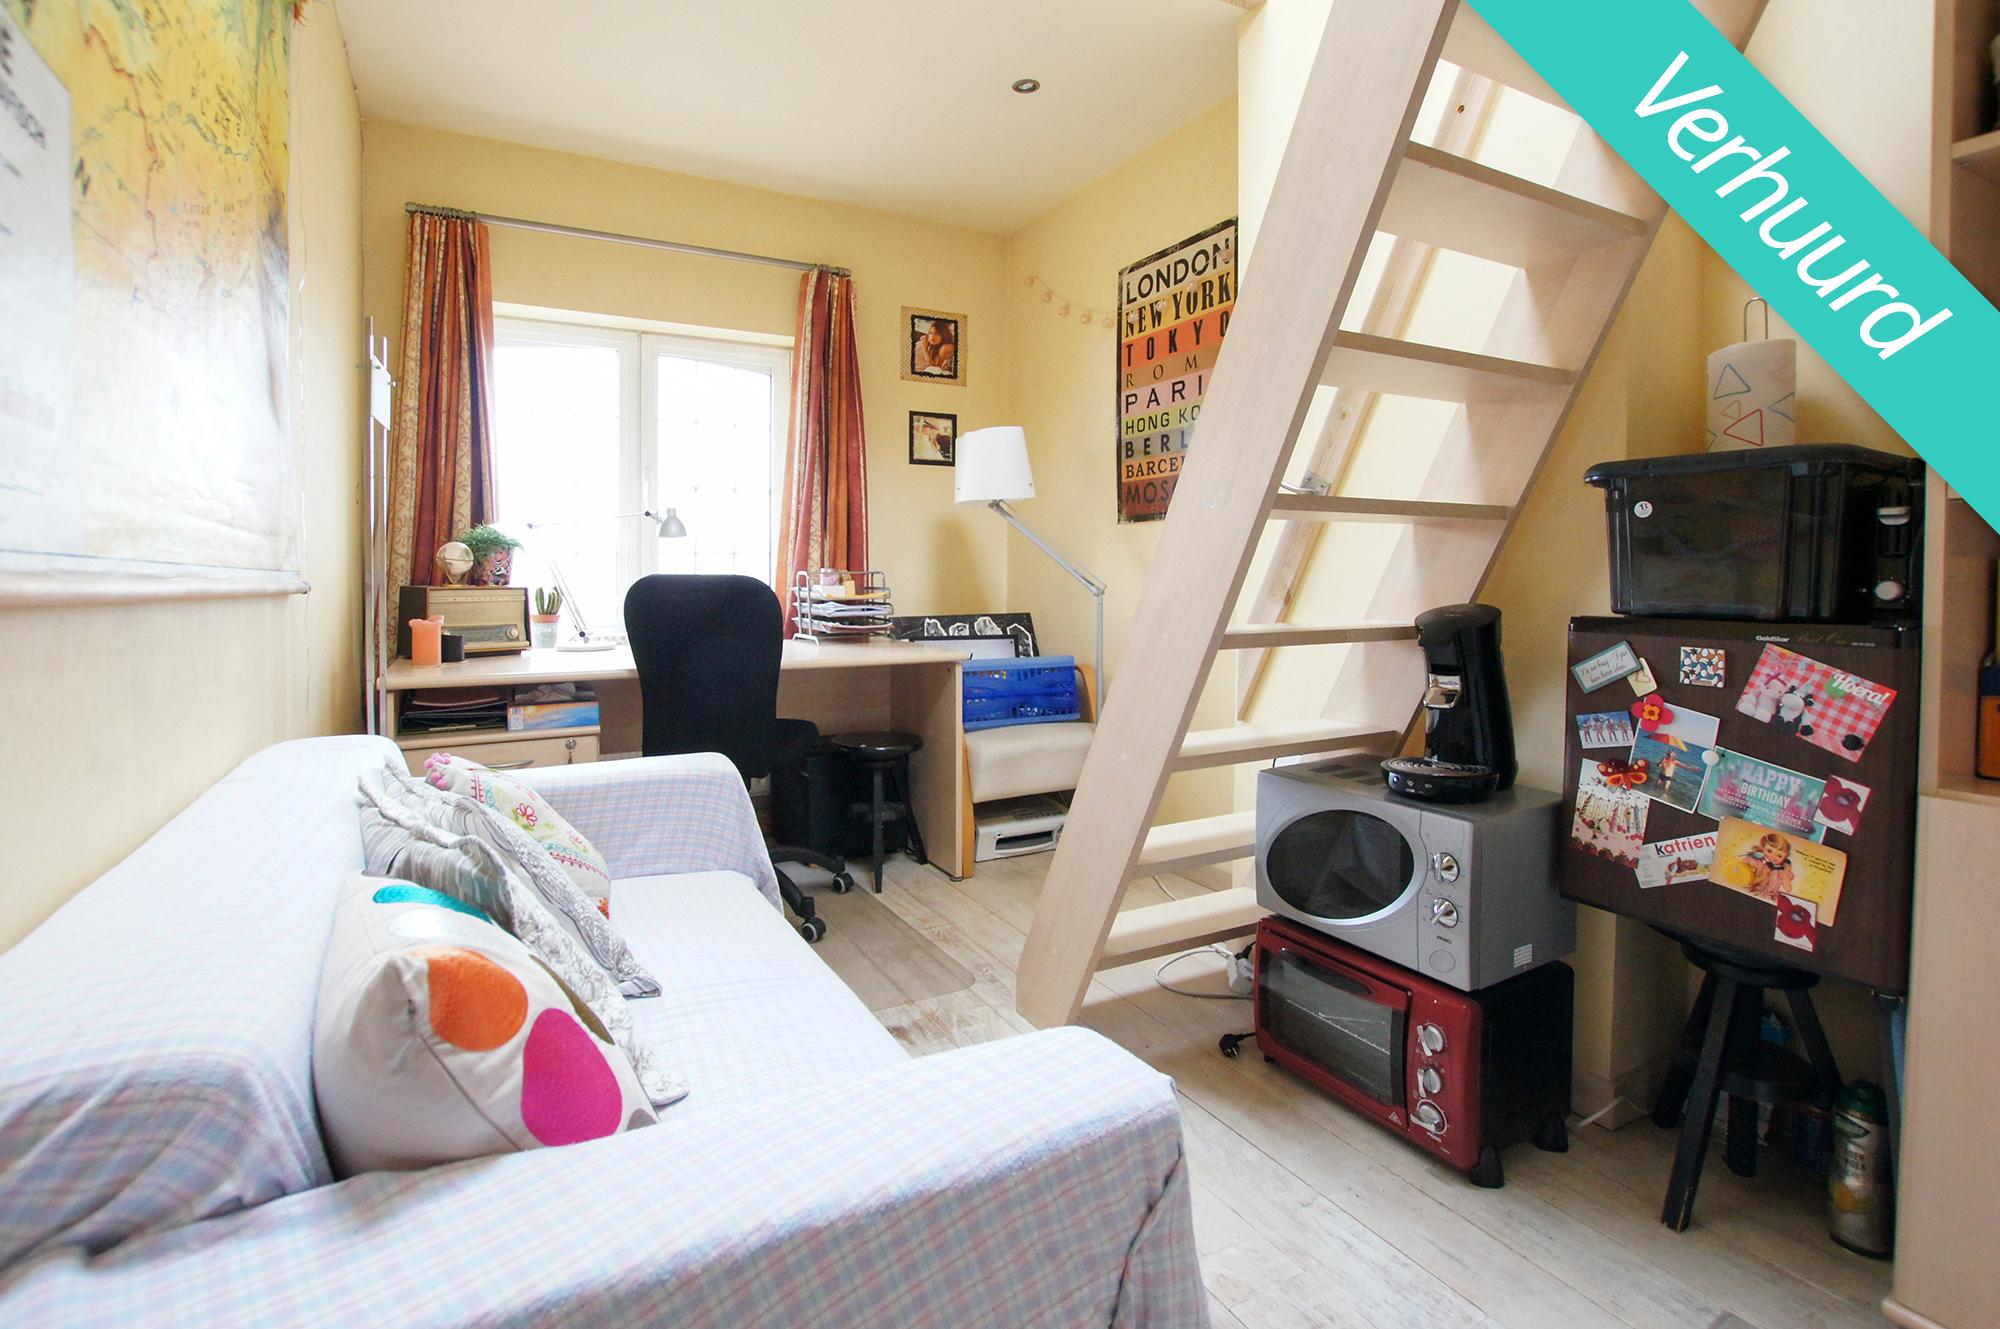 Kamer 8 - Frederik Lintsstraat 52 - kot verhuurd